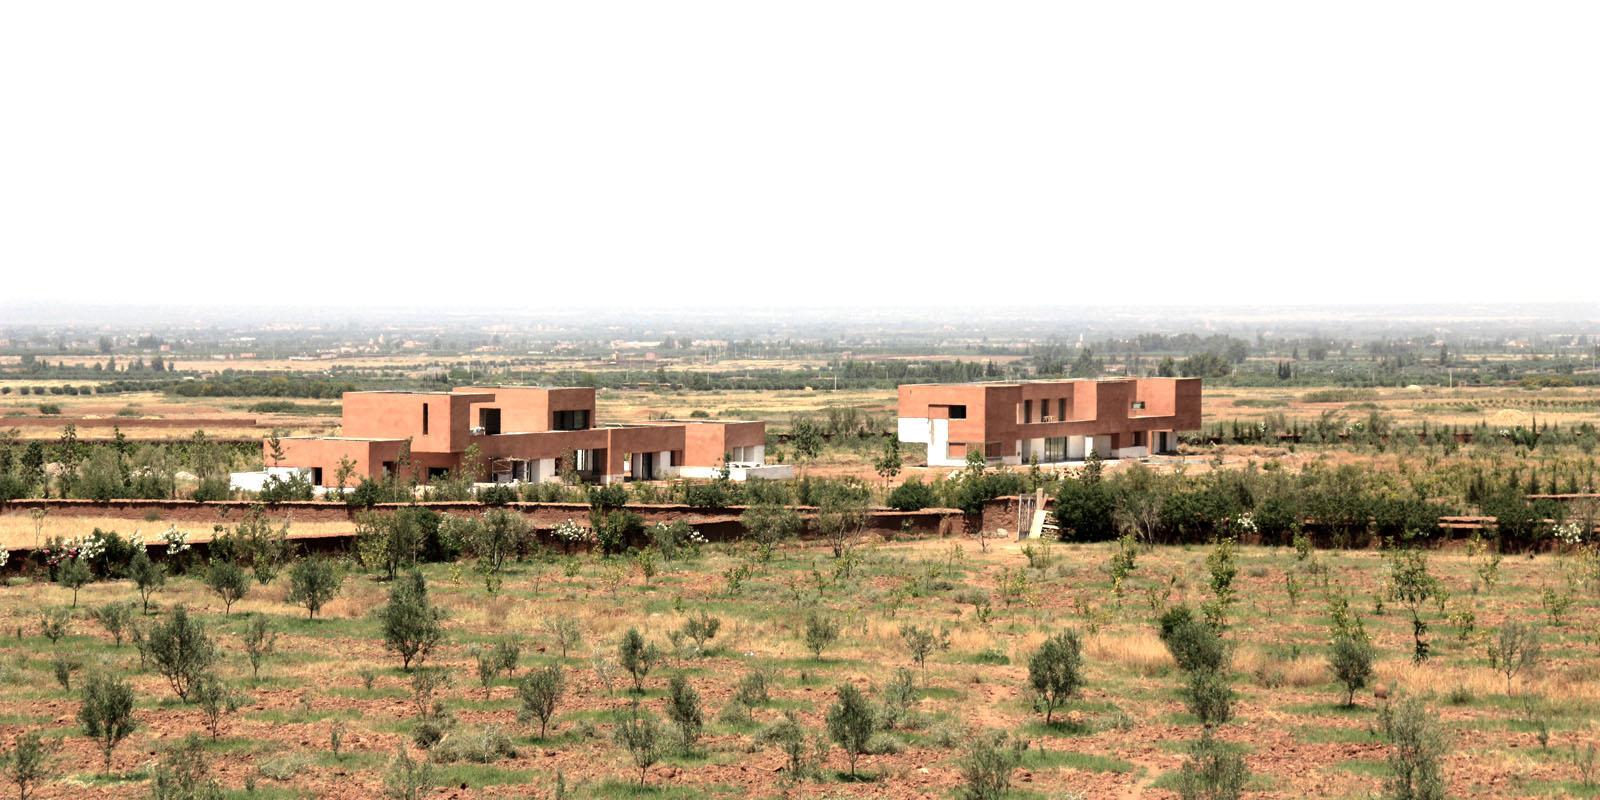 co-habitation-kilo-architectures-luc-boegly-07